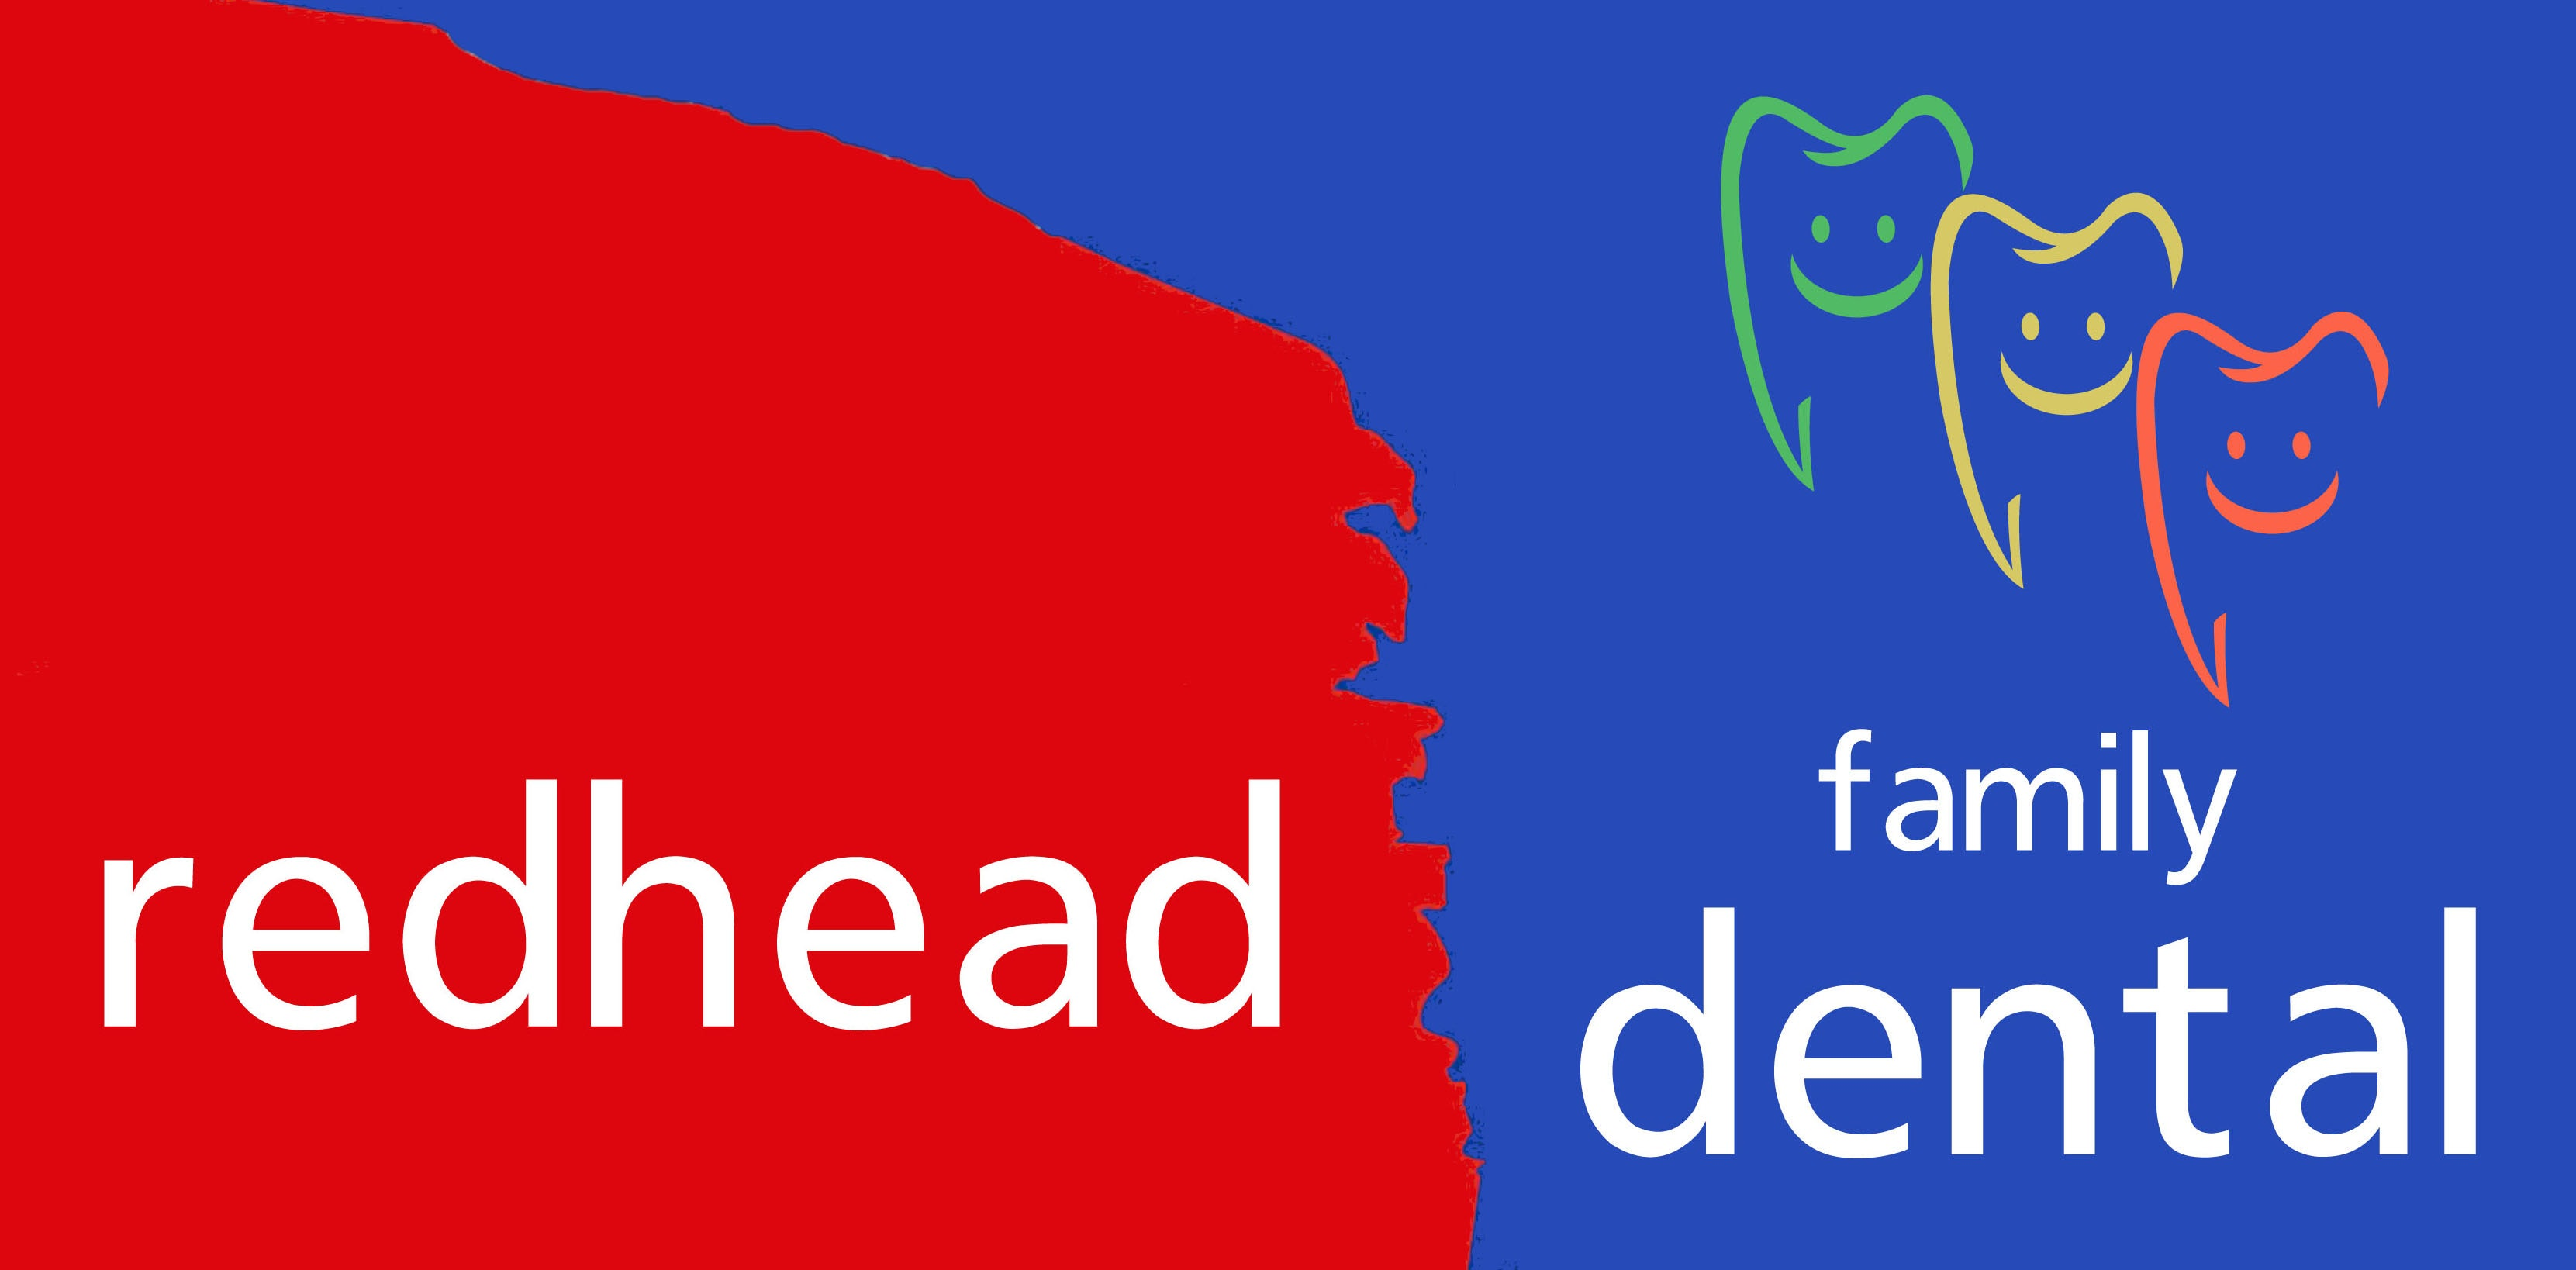 logo for Redhead Family Dental Dentists